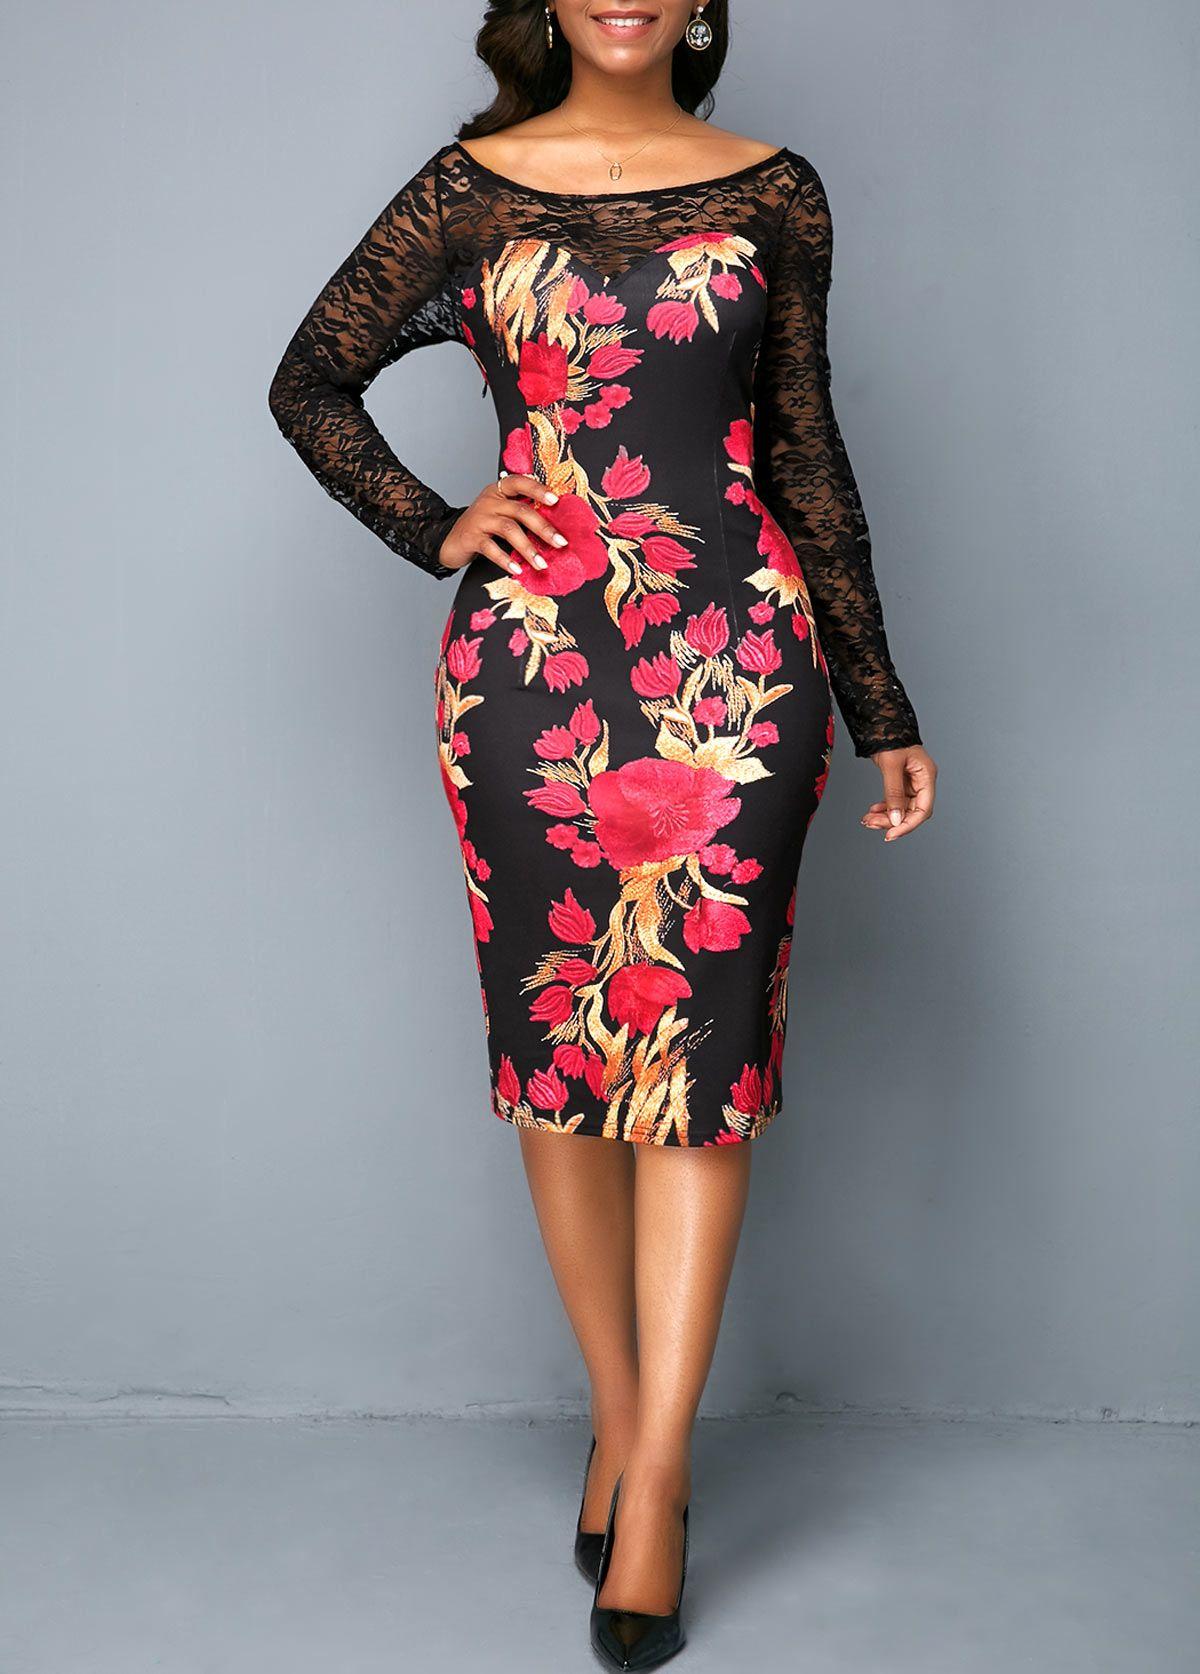 4188008a087 Flower Print Back Slit Lace Panel Sheath Dress